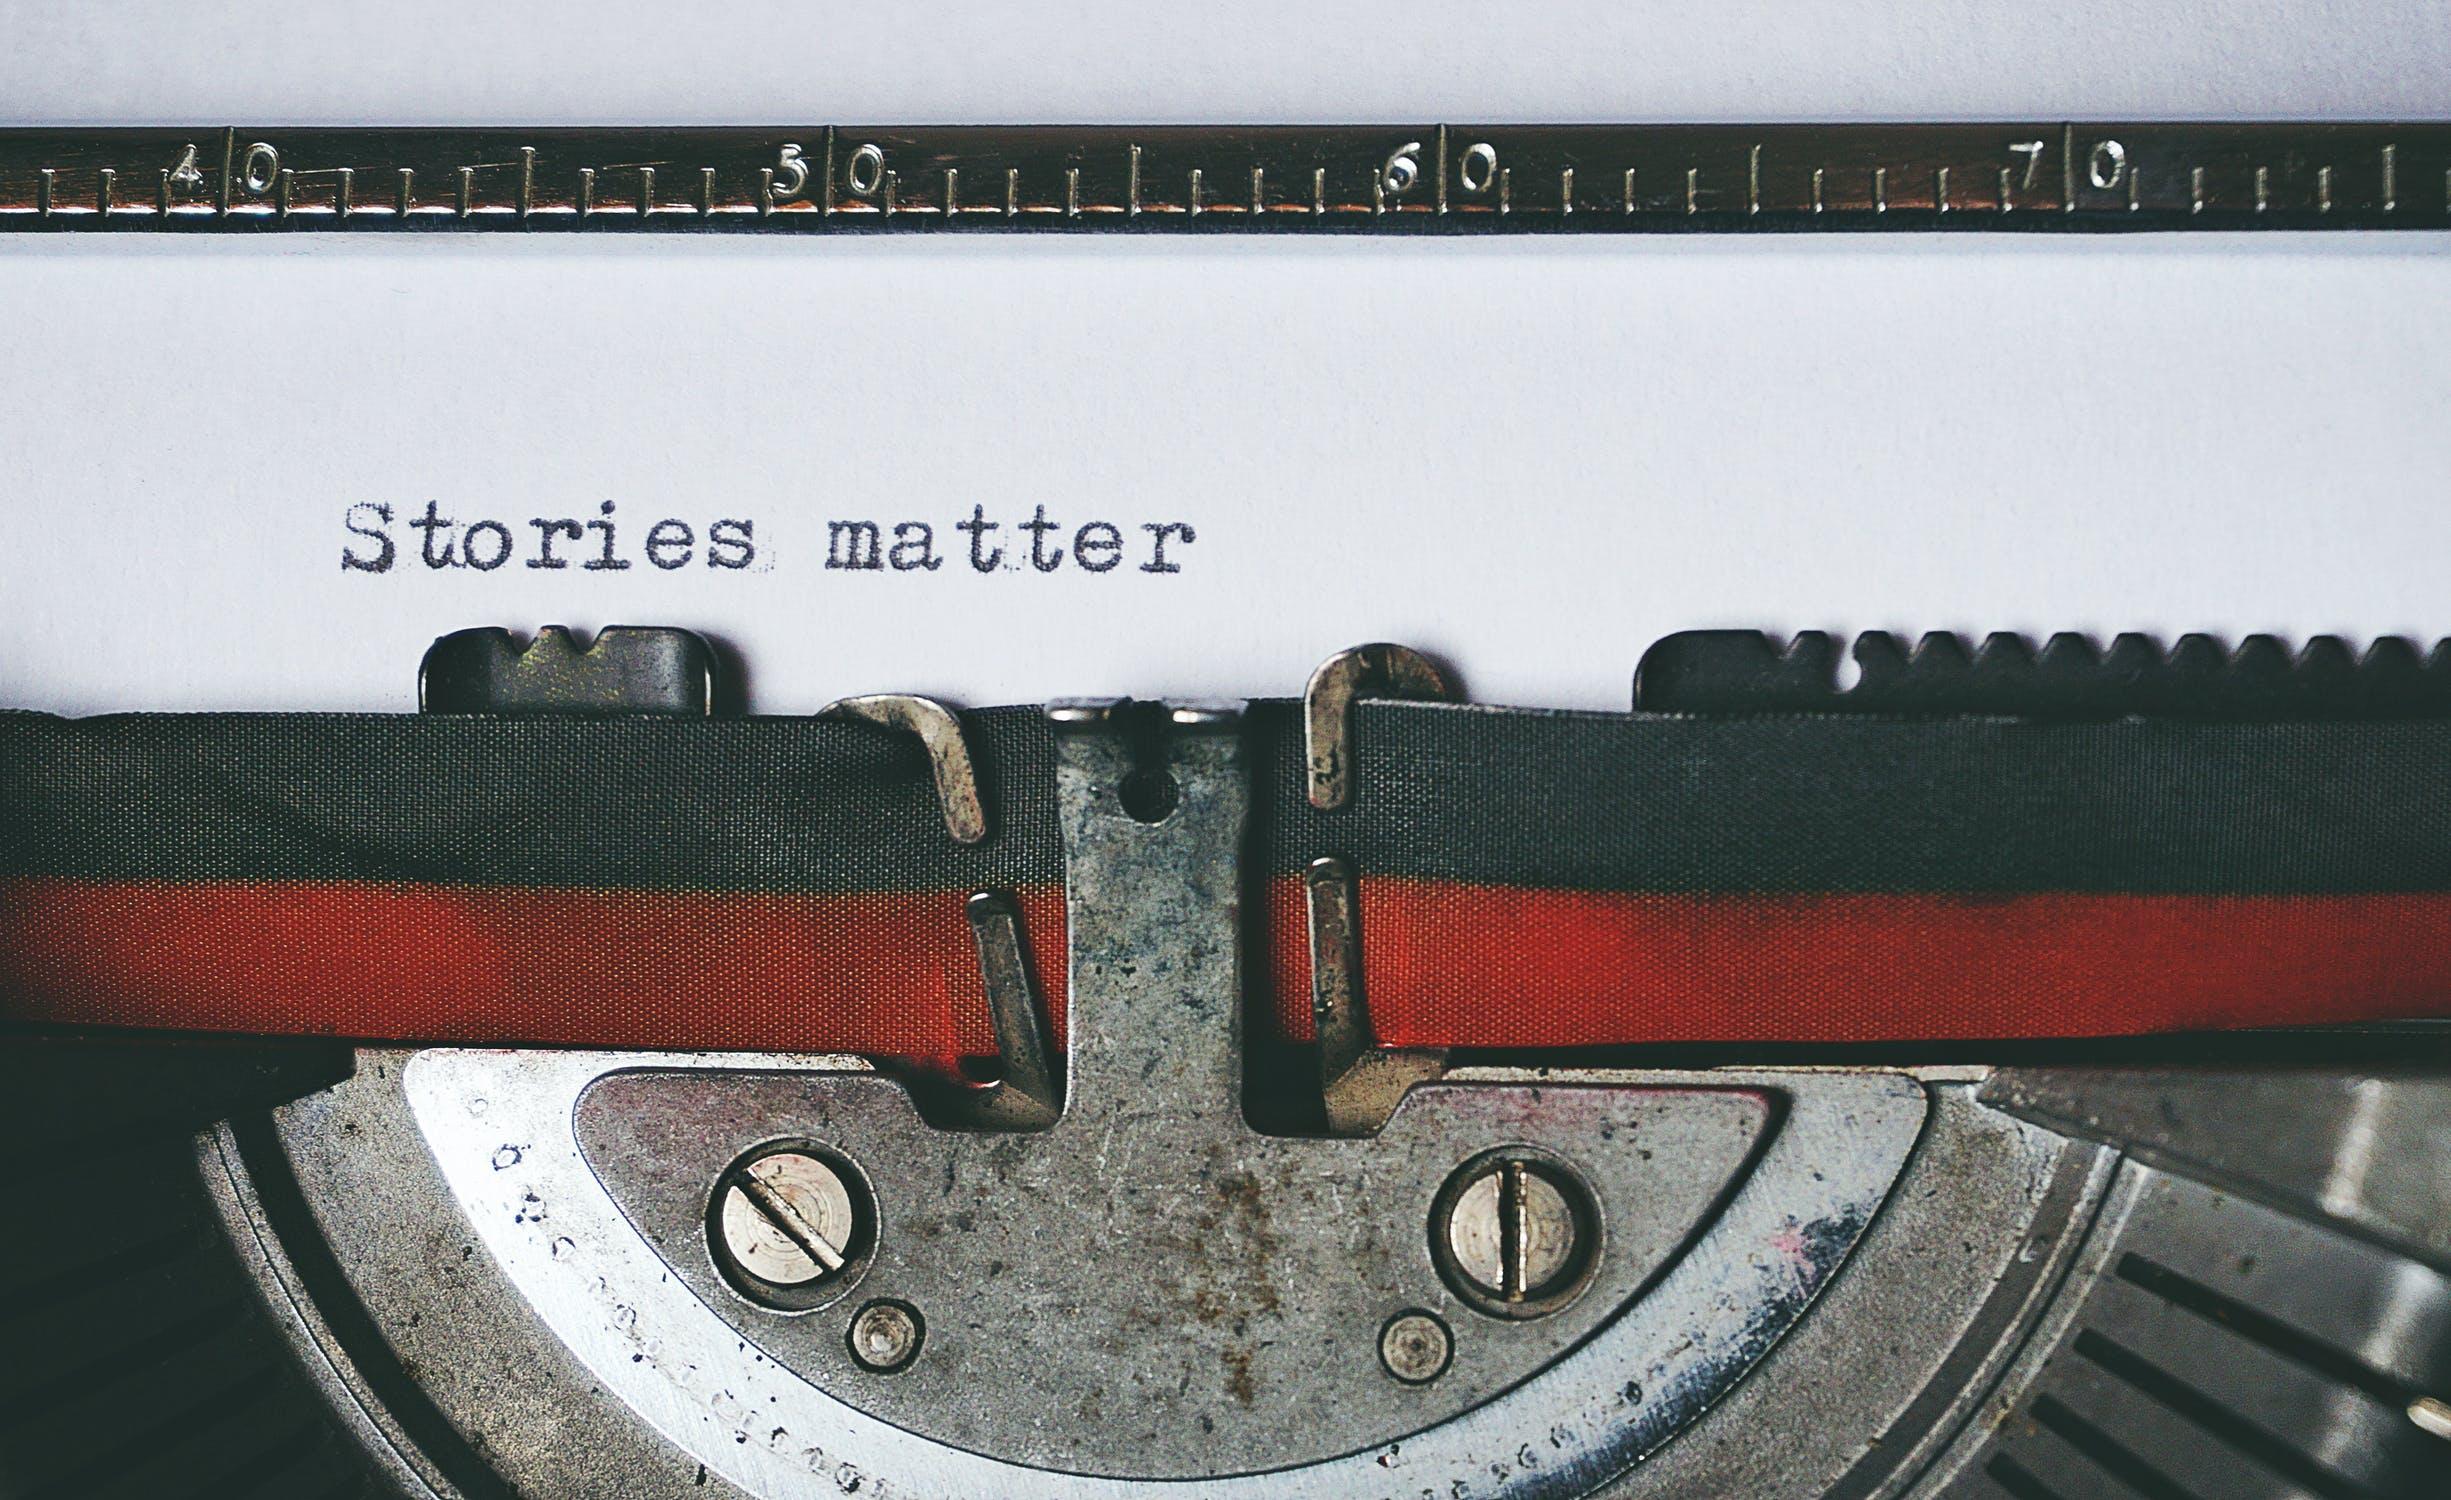 sometimes stories is need like type on typewriter